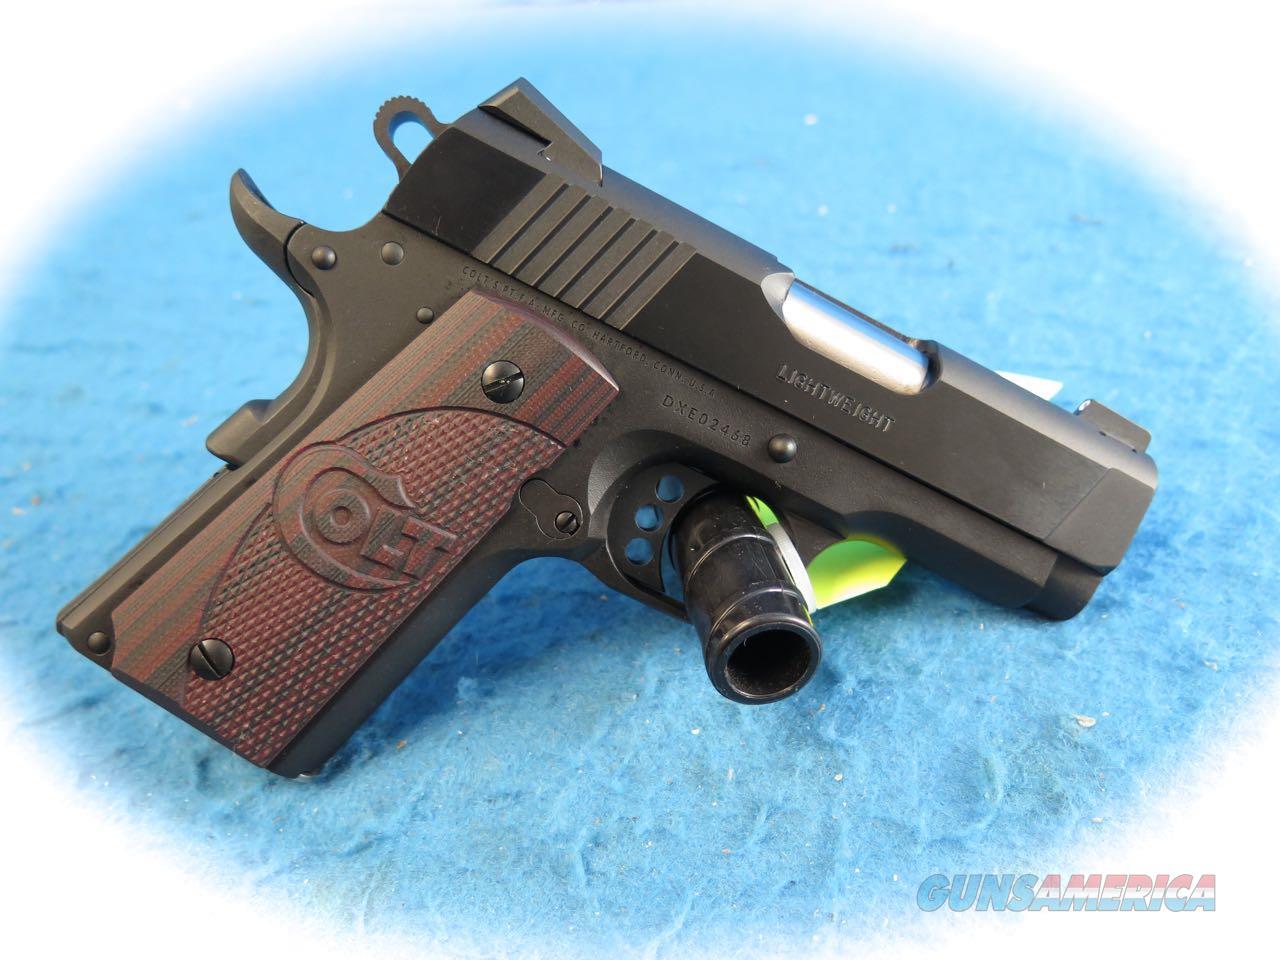 Colt 1911 Defender Lightweight XSE .45 ACP Pistol Model O7800XE **New**  Guns > Pistols > Colt Automatic Pistols (1911 & Var)